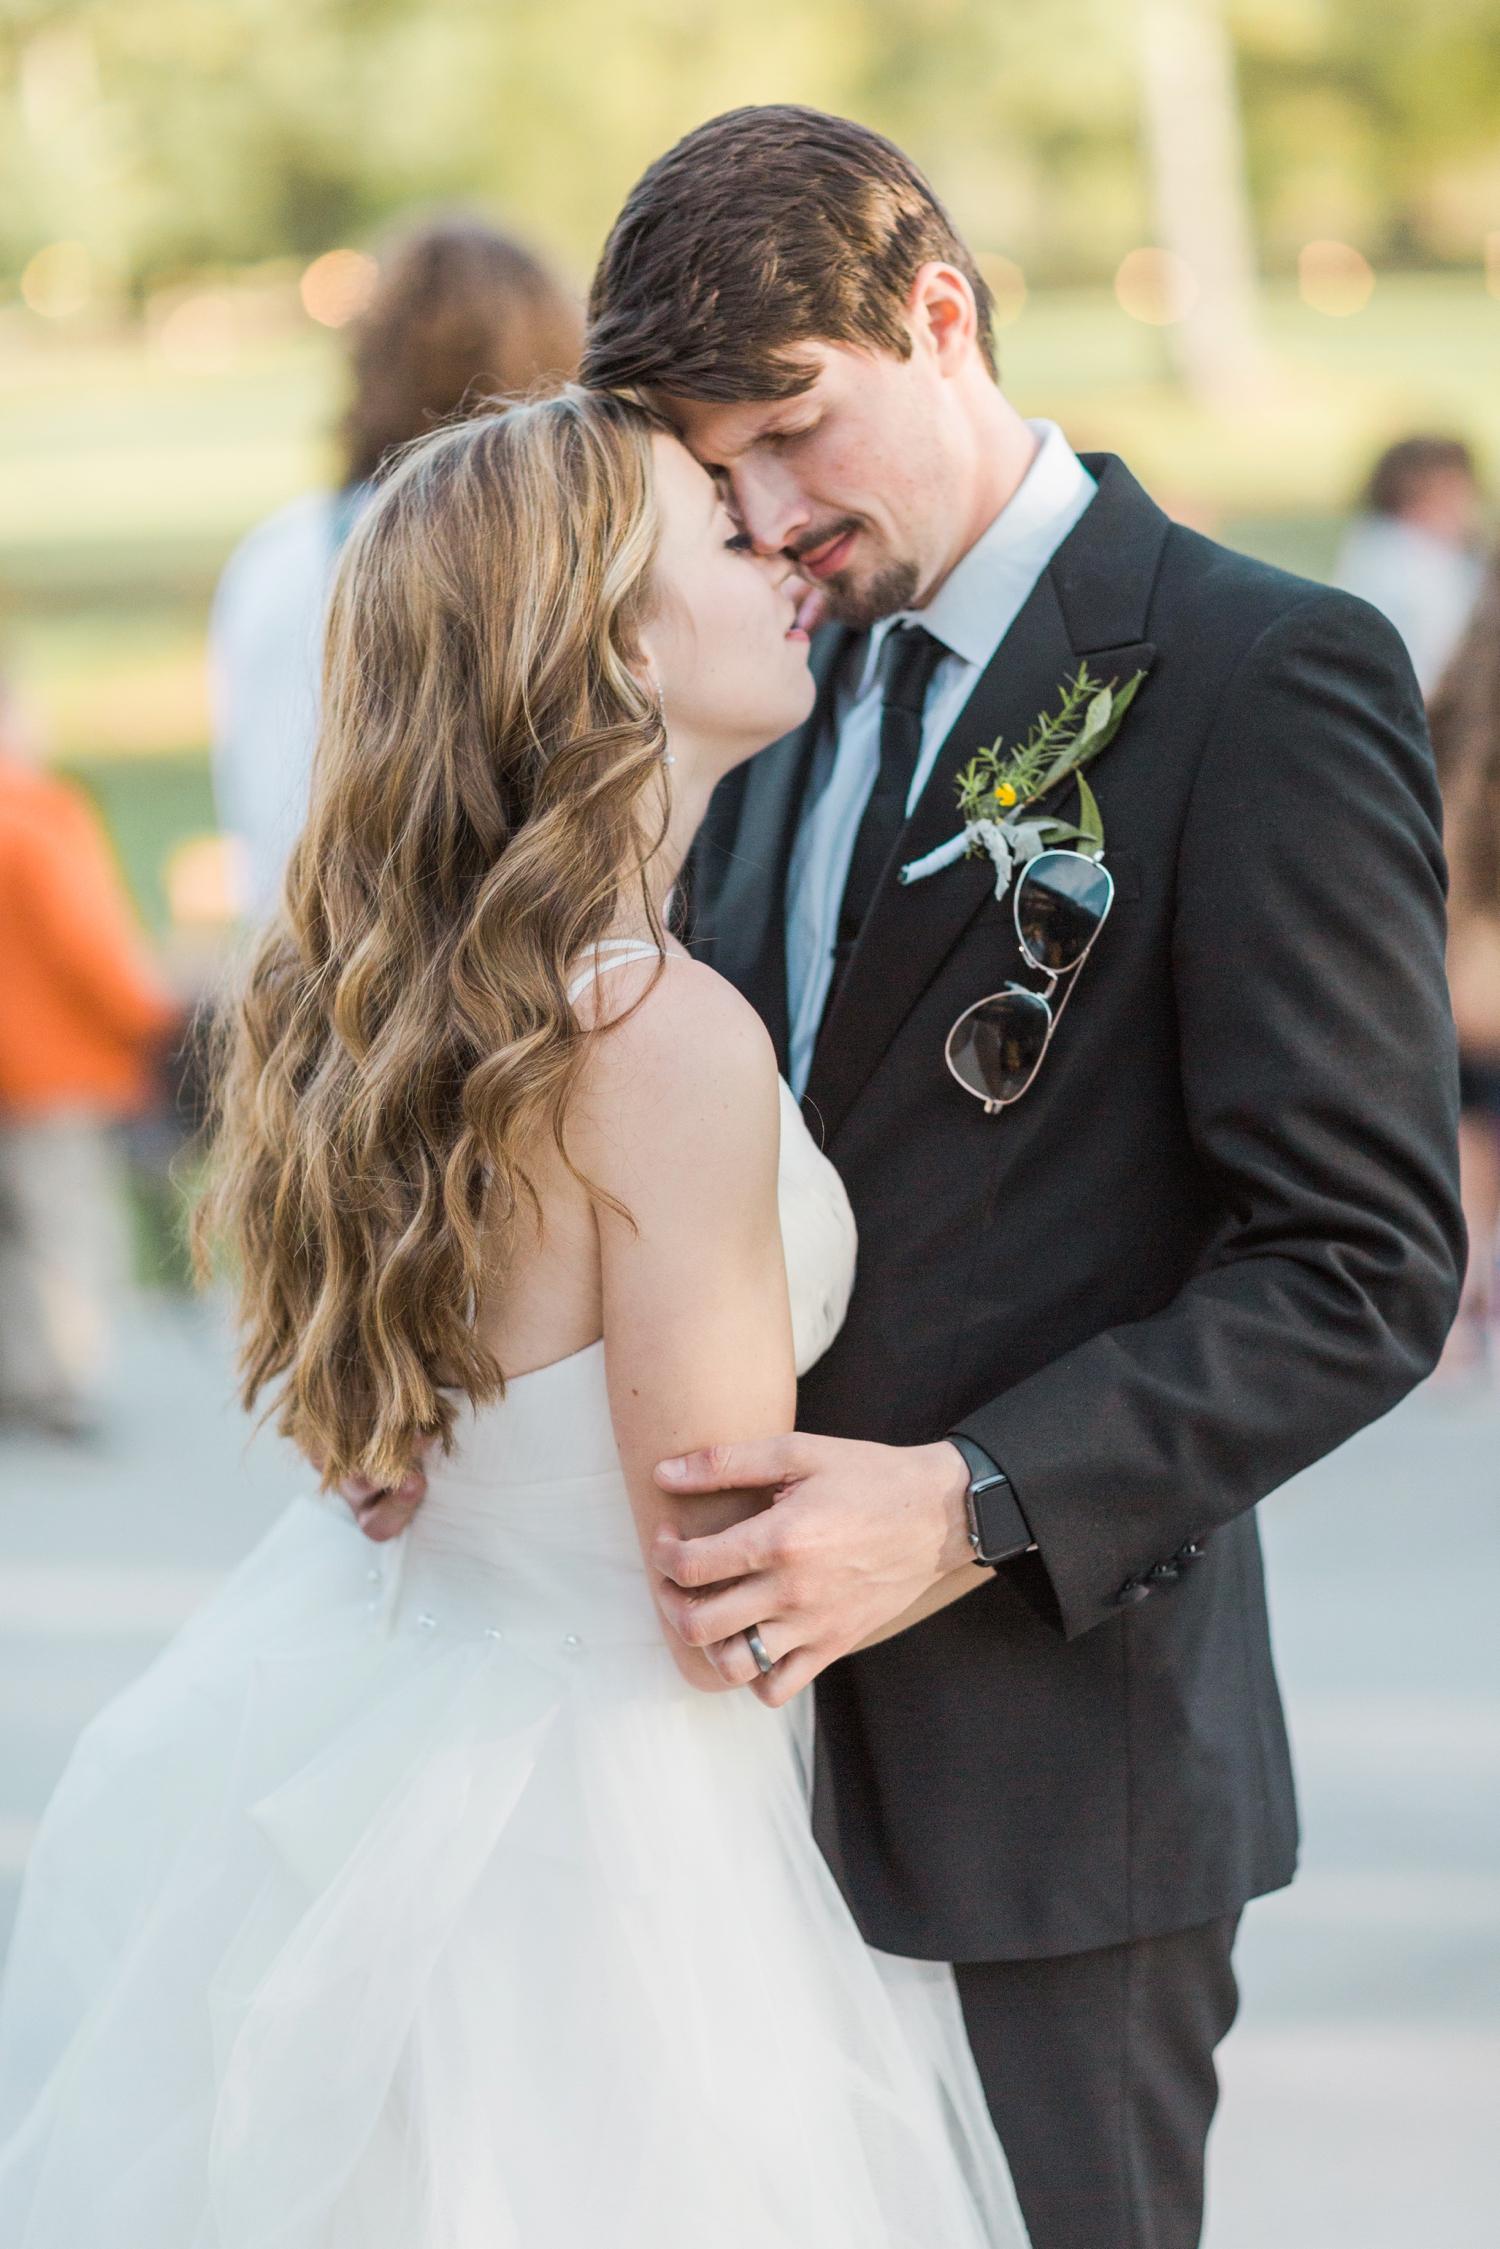 fine-art-film-charleston-south-carolina-wedding-photographer-atlanta-georgia_3475.jpg